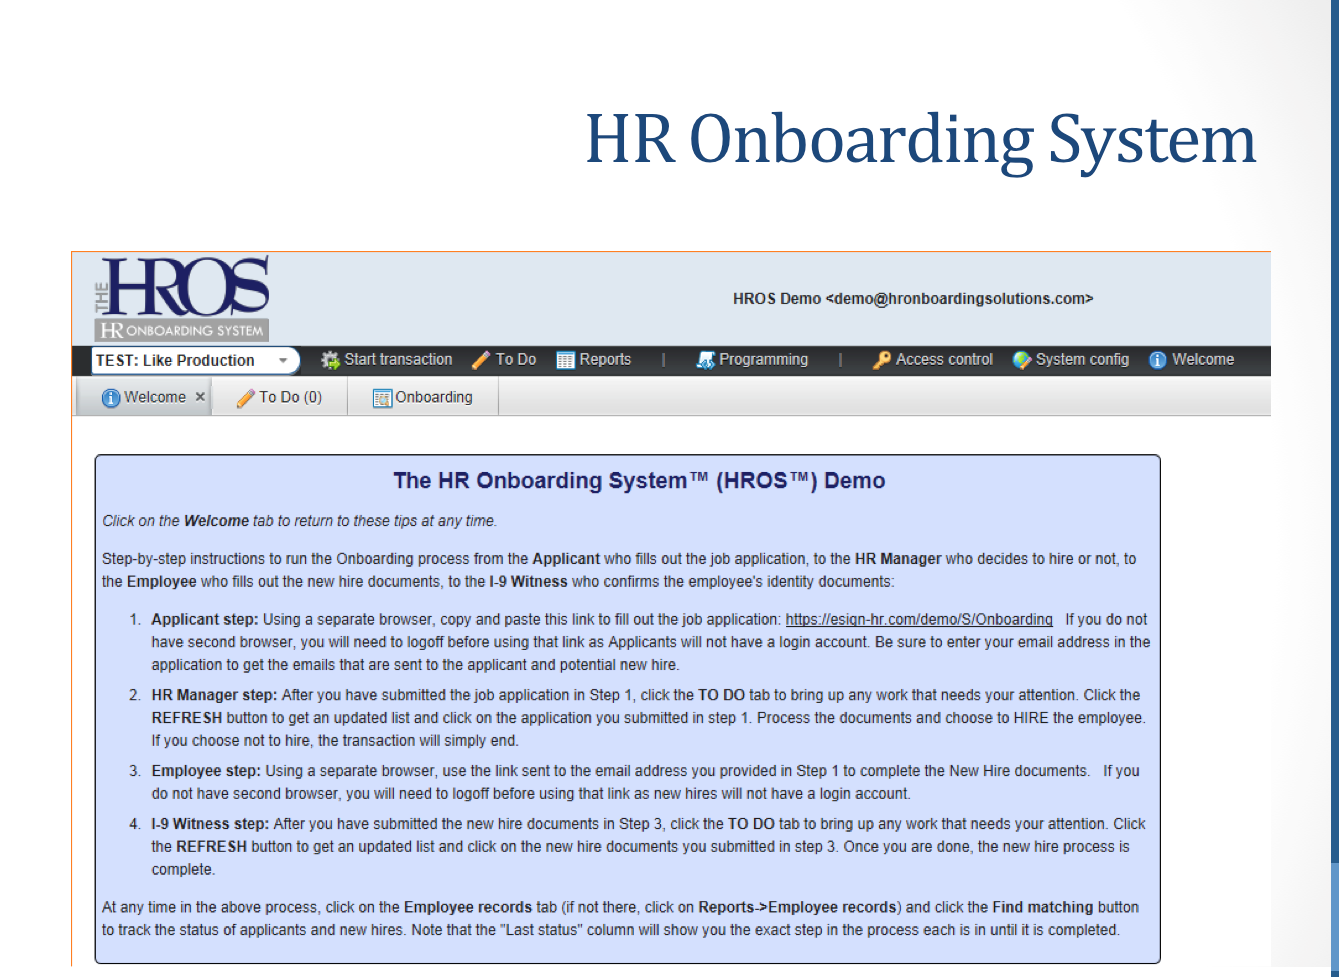 HR onboarding system